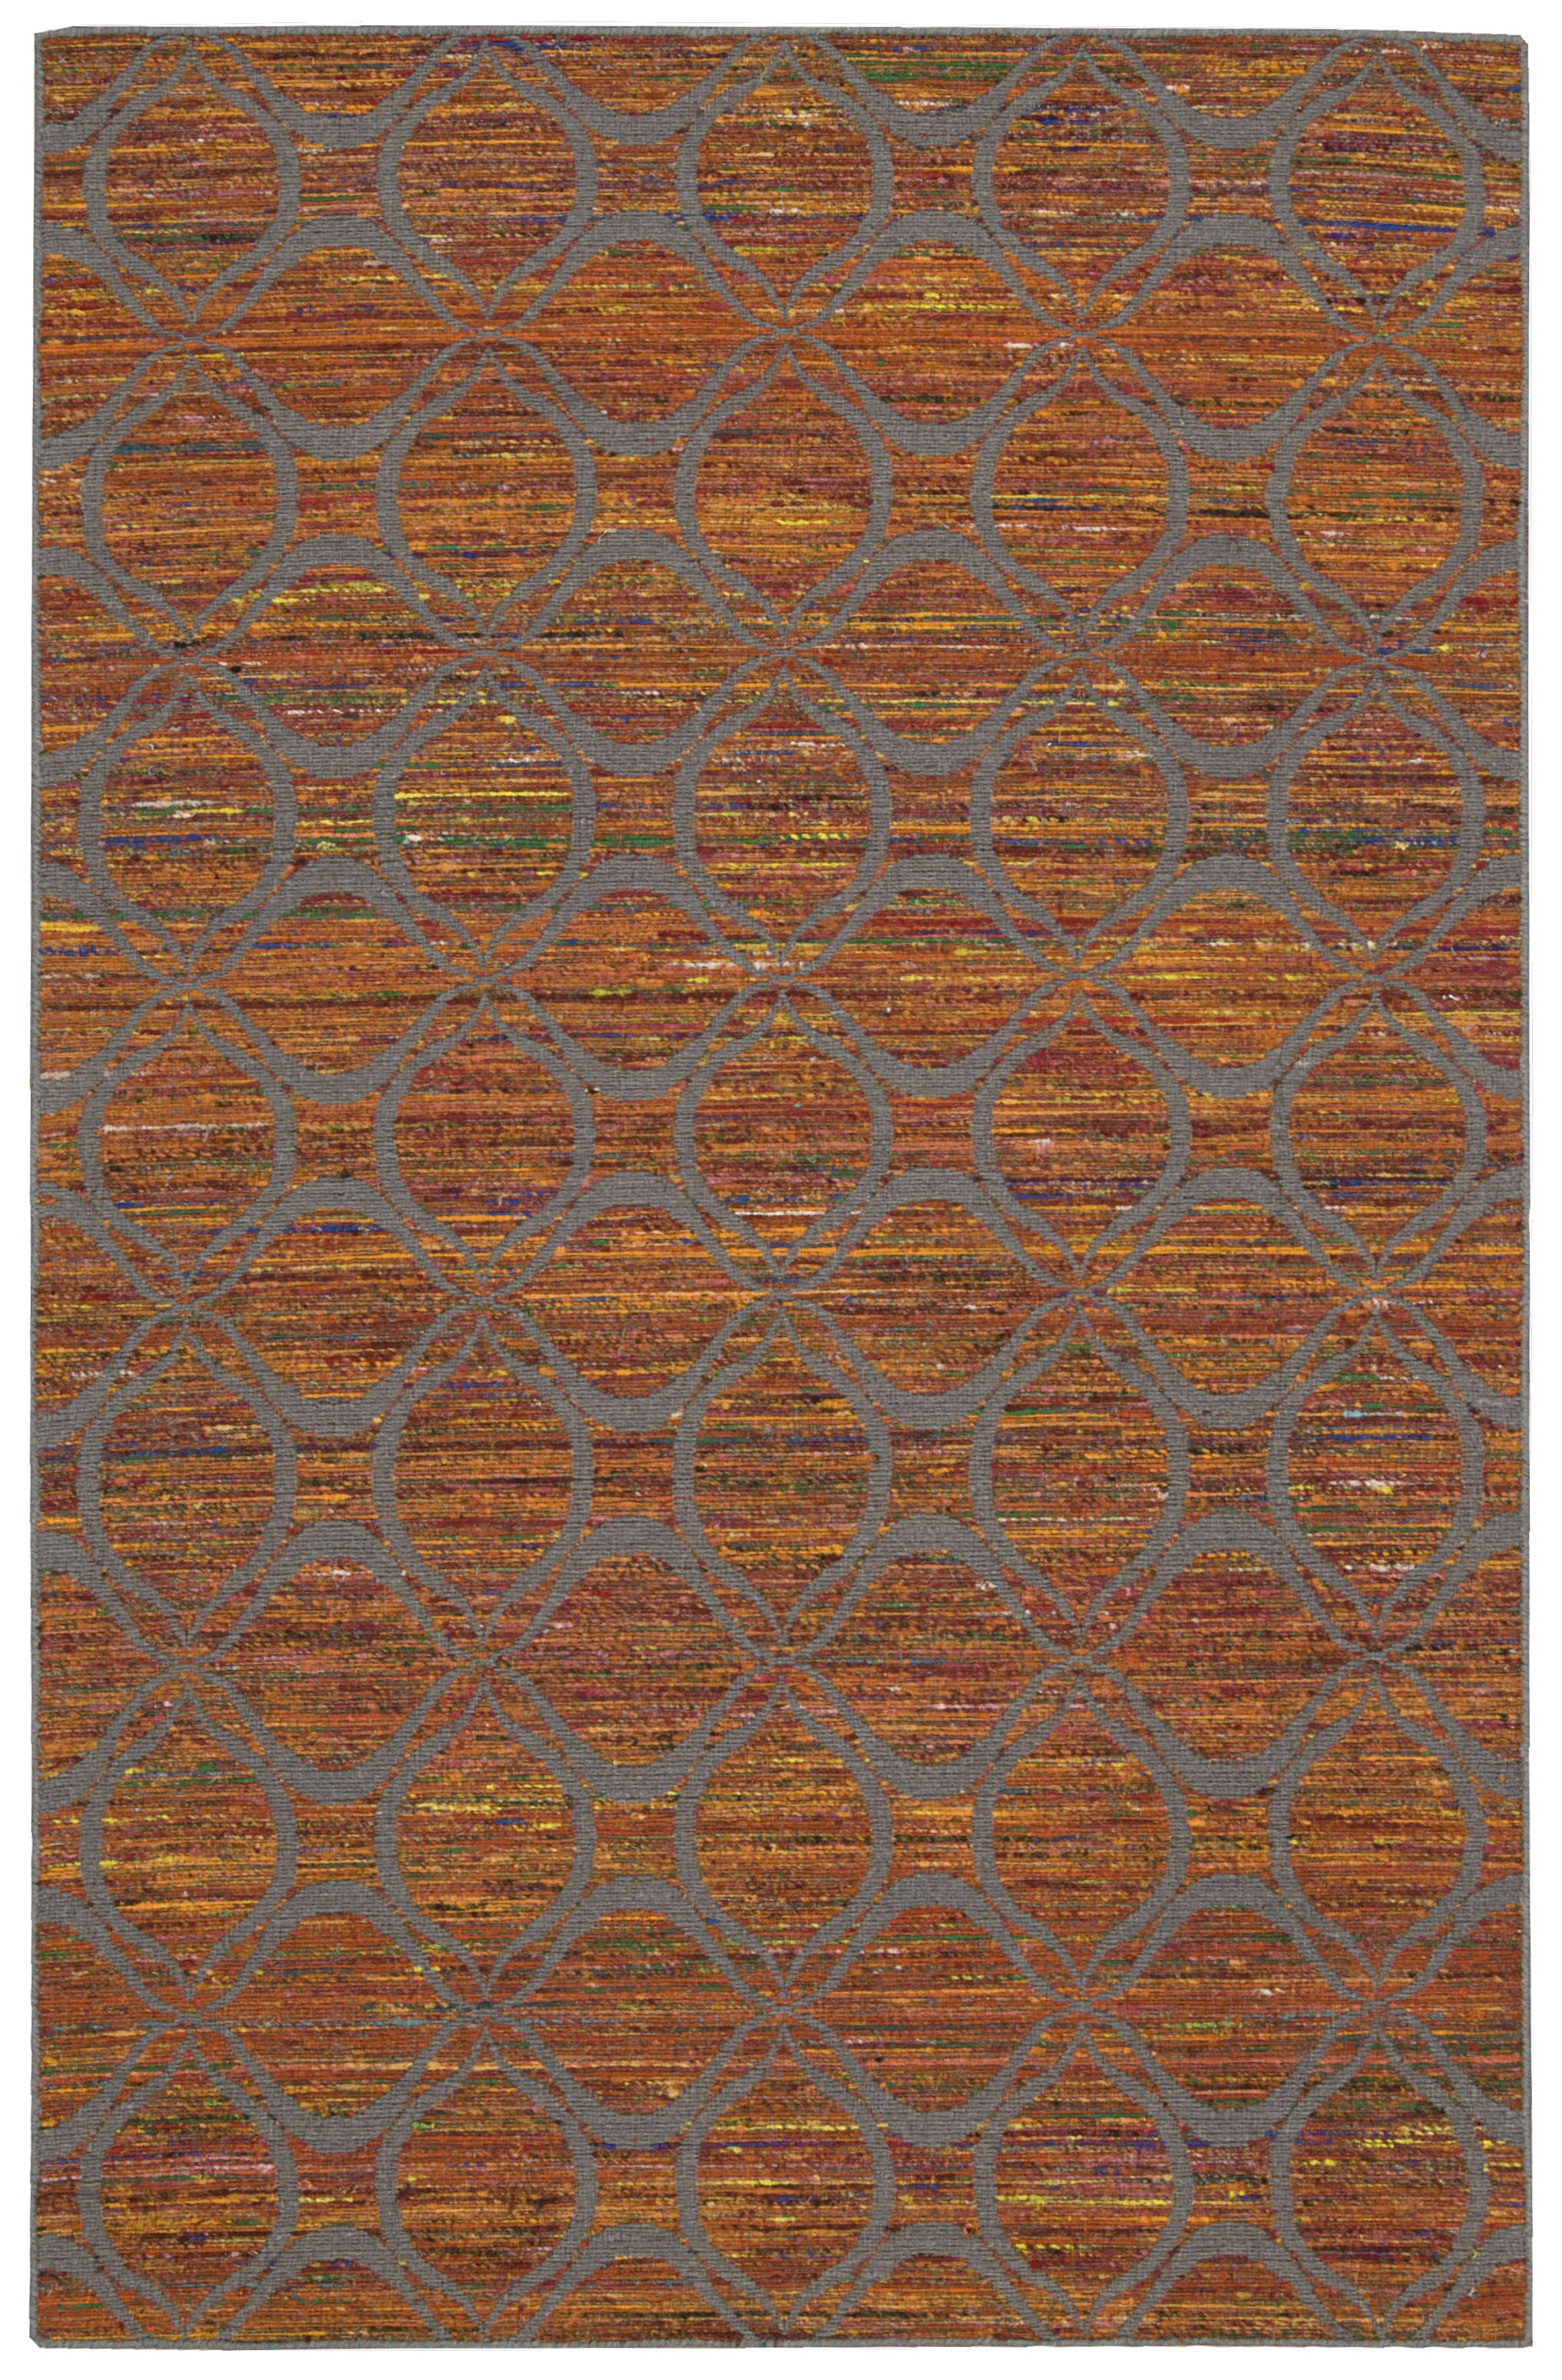 Pine Grove Hand-Woven Flame/Gray Area Rug Rug Size: Rectangle 8' x 10'6